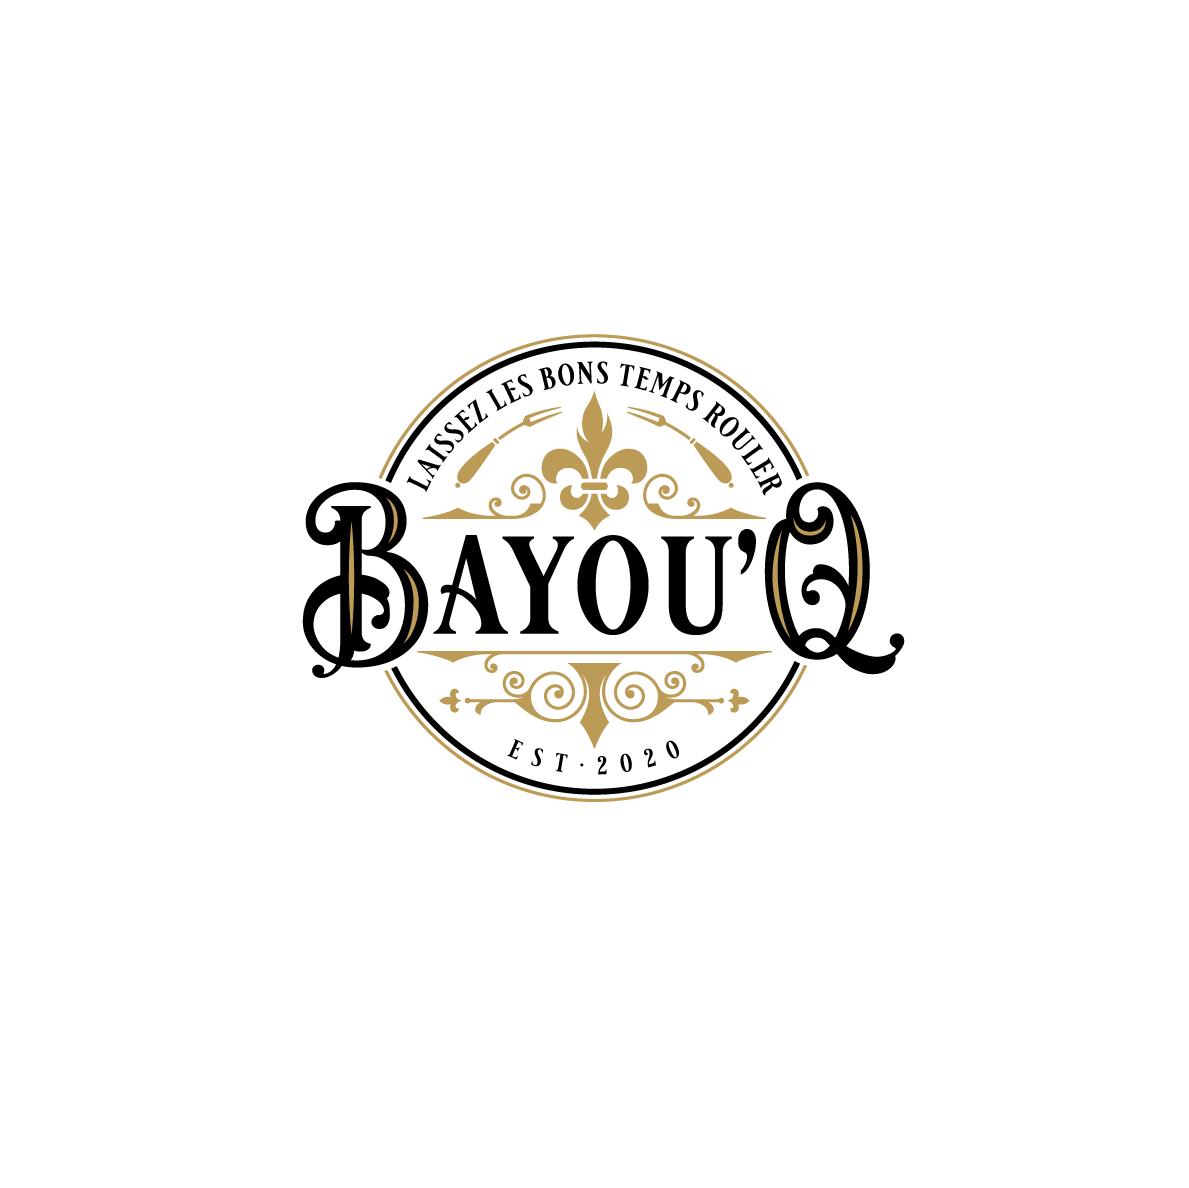 We need a cool logo design for New Cajun BBQ Restaurant